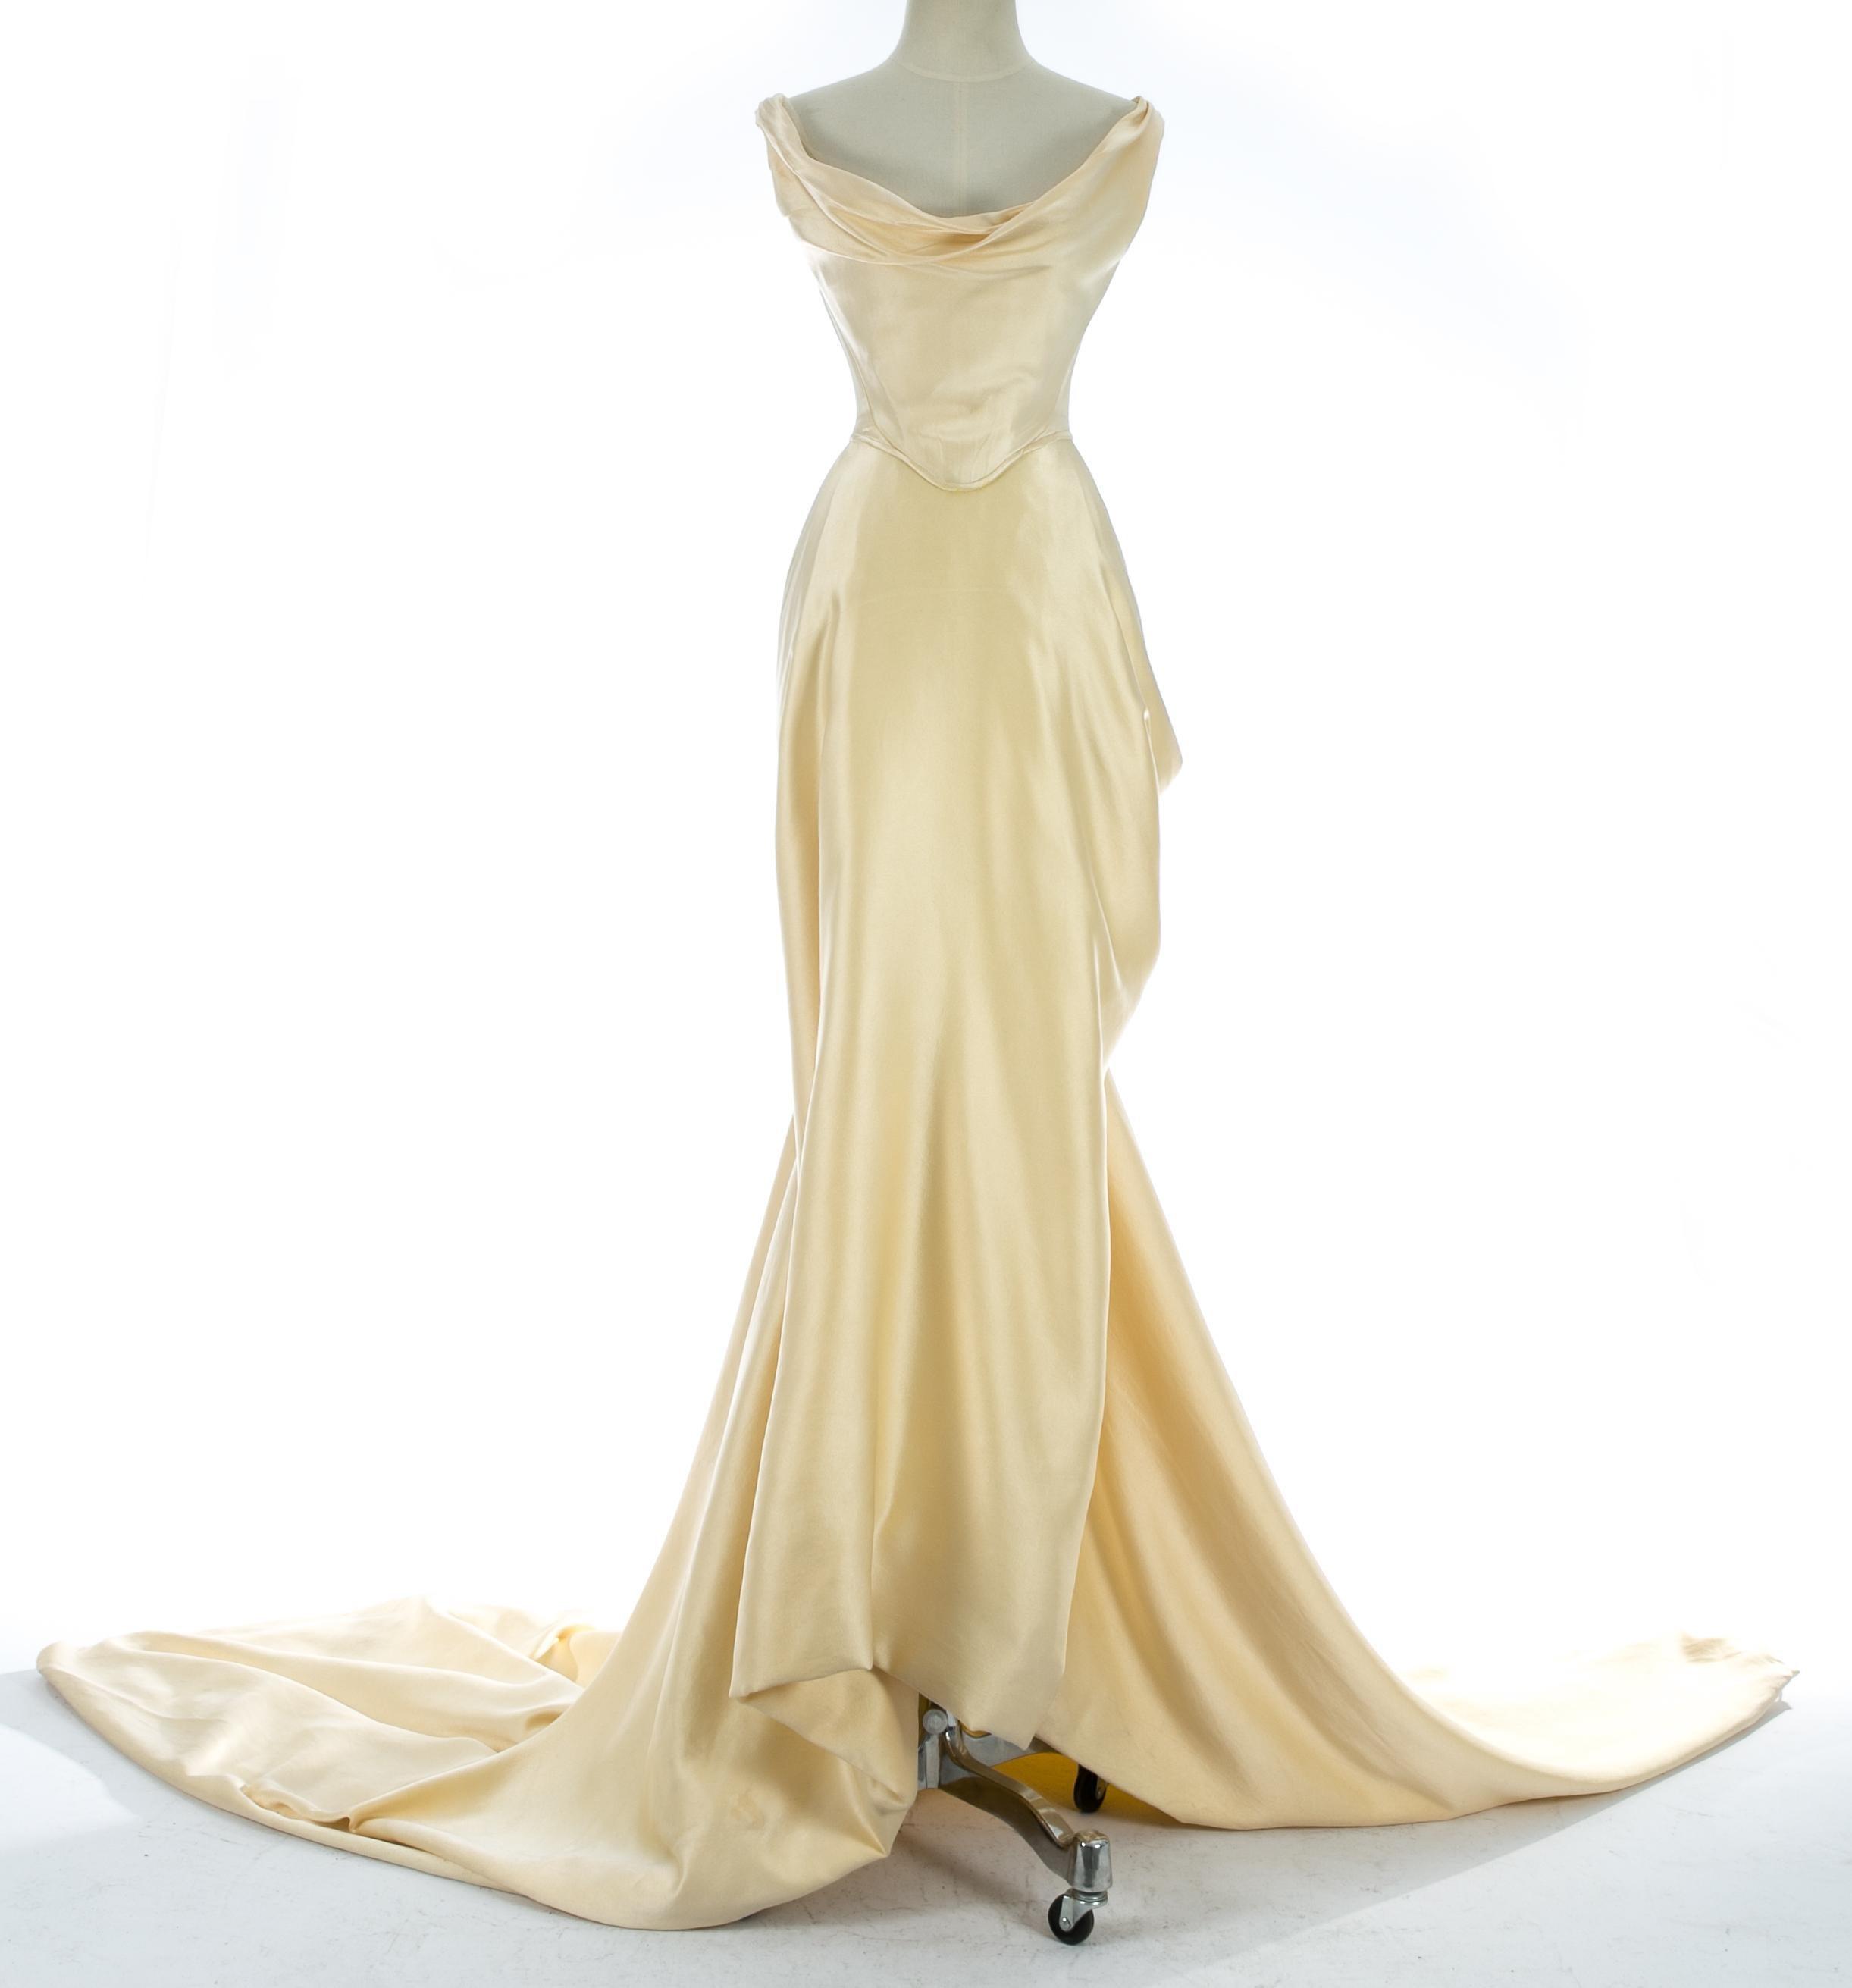 Viviene Westwood Wedding Dresses.Vivienne Westwood Cream Silk Corset And Draped Skirt Wedding Ensemble C 1999